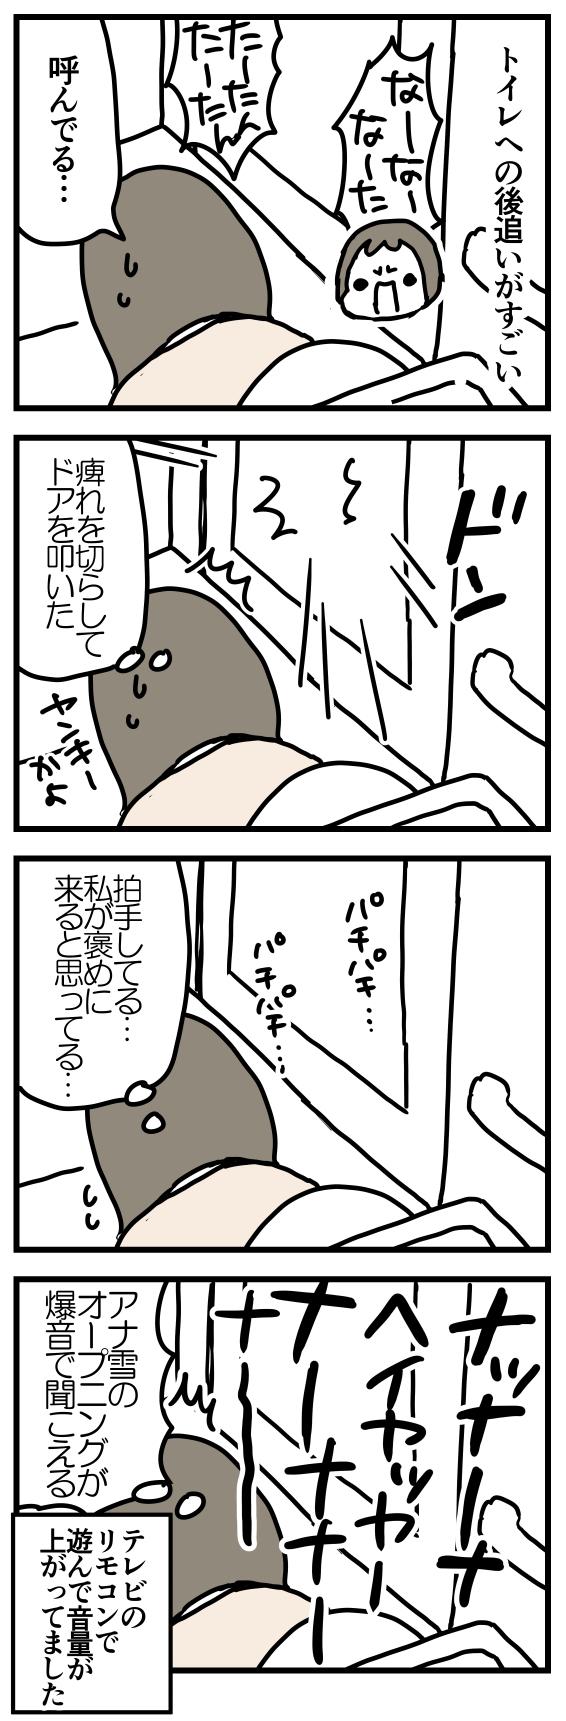 f:id:kanemotonomukuu:20180106203423j:plain